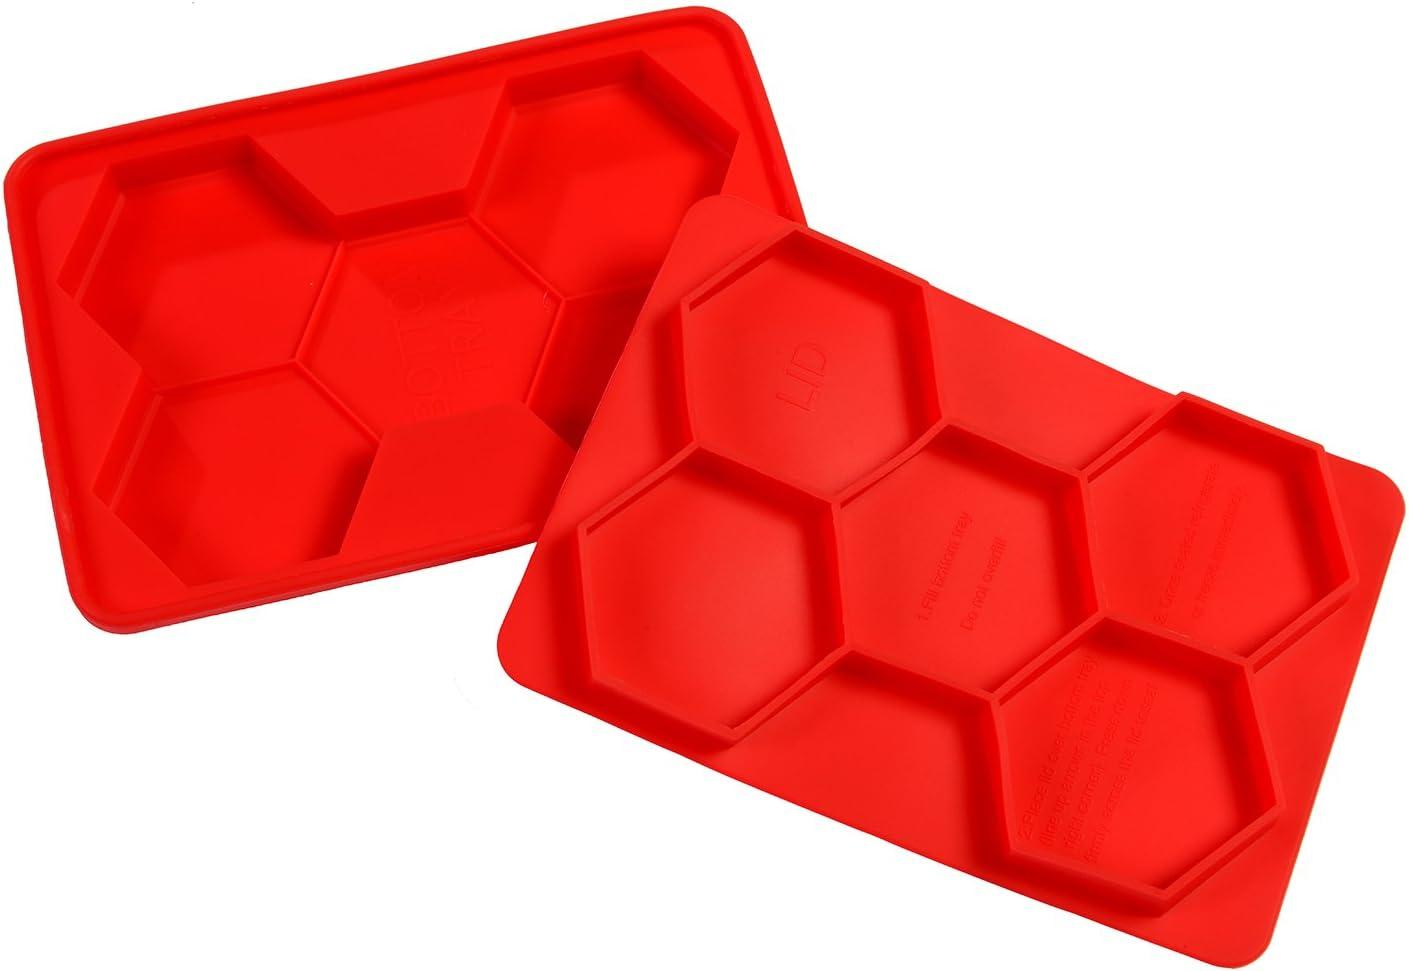 5 in 1 Hexagon Burger Press Nonstick Flexible Red Silicone BBQ Patty Mold